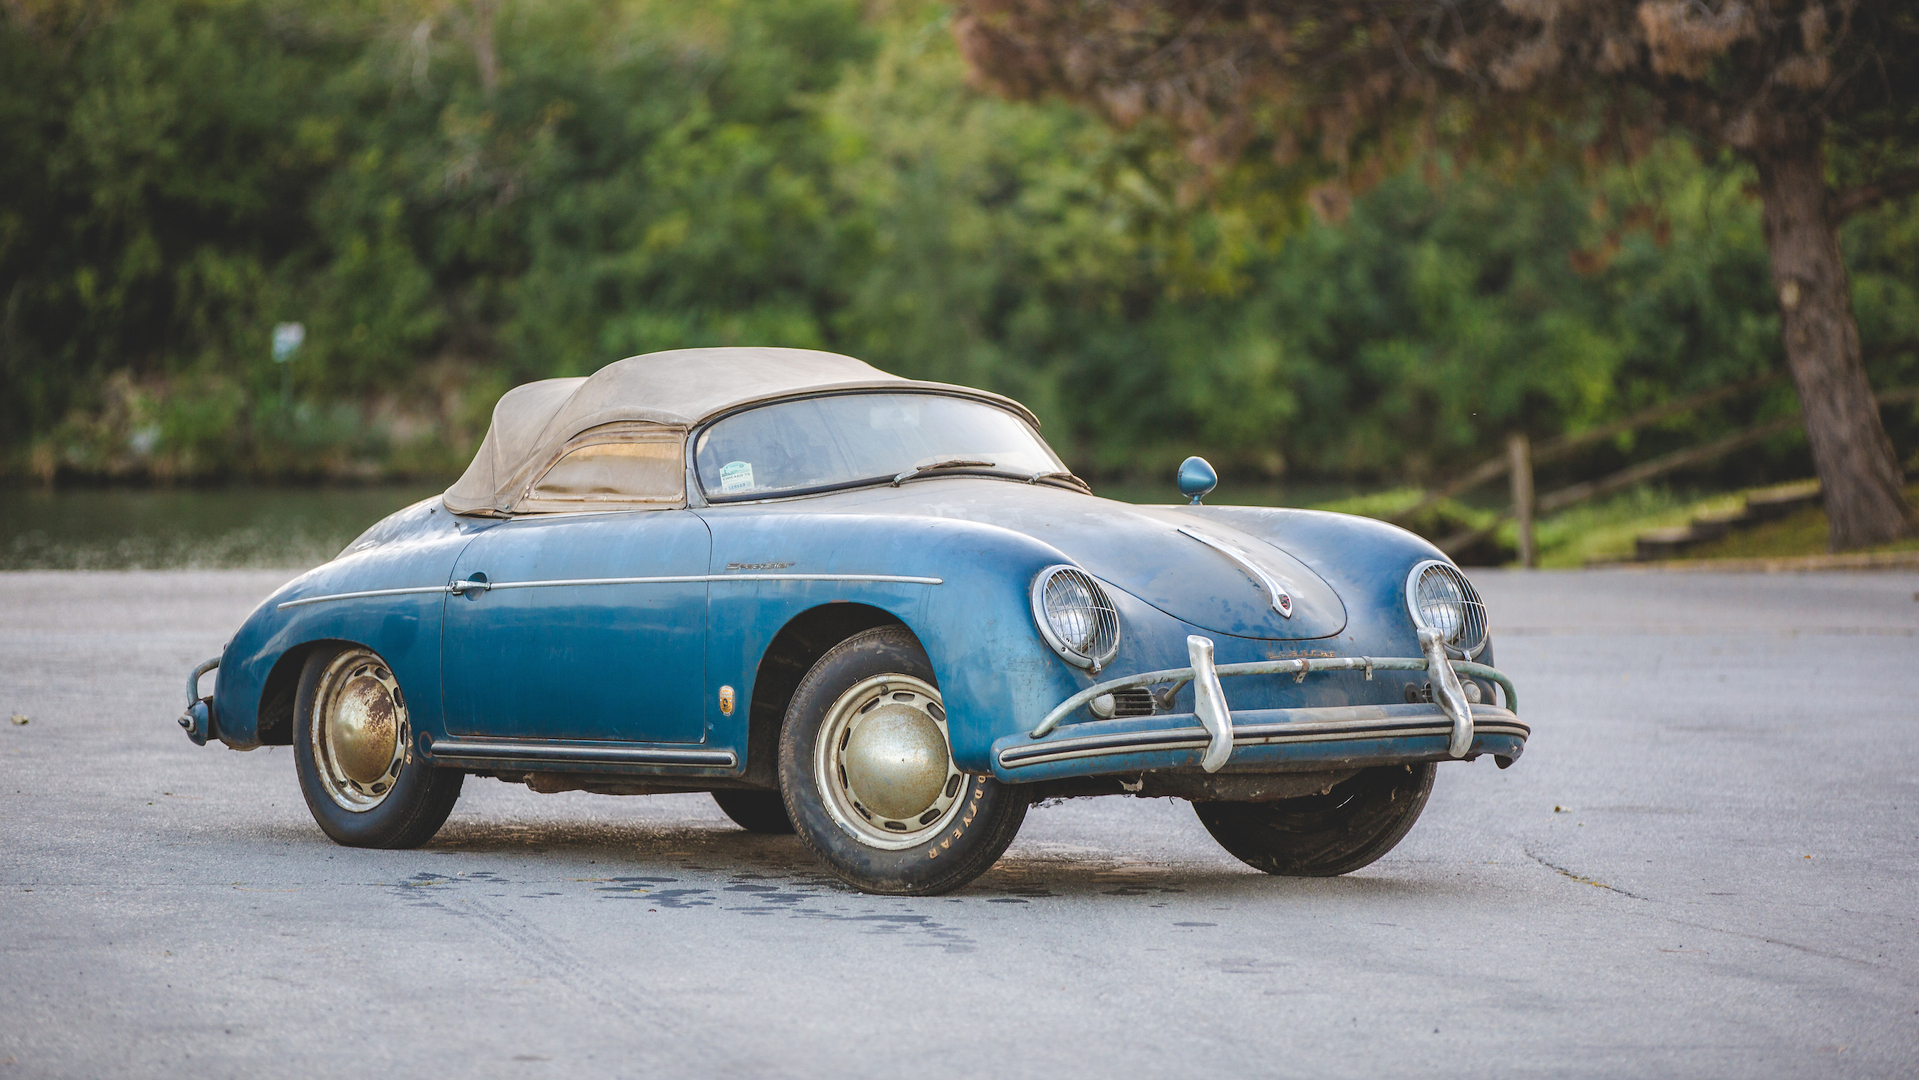 Barn find Porsche 356 Sdster heads to auction with original dust